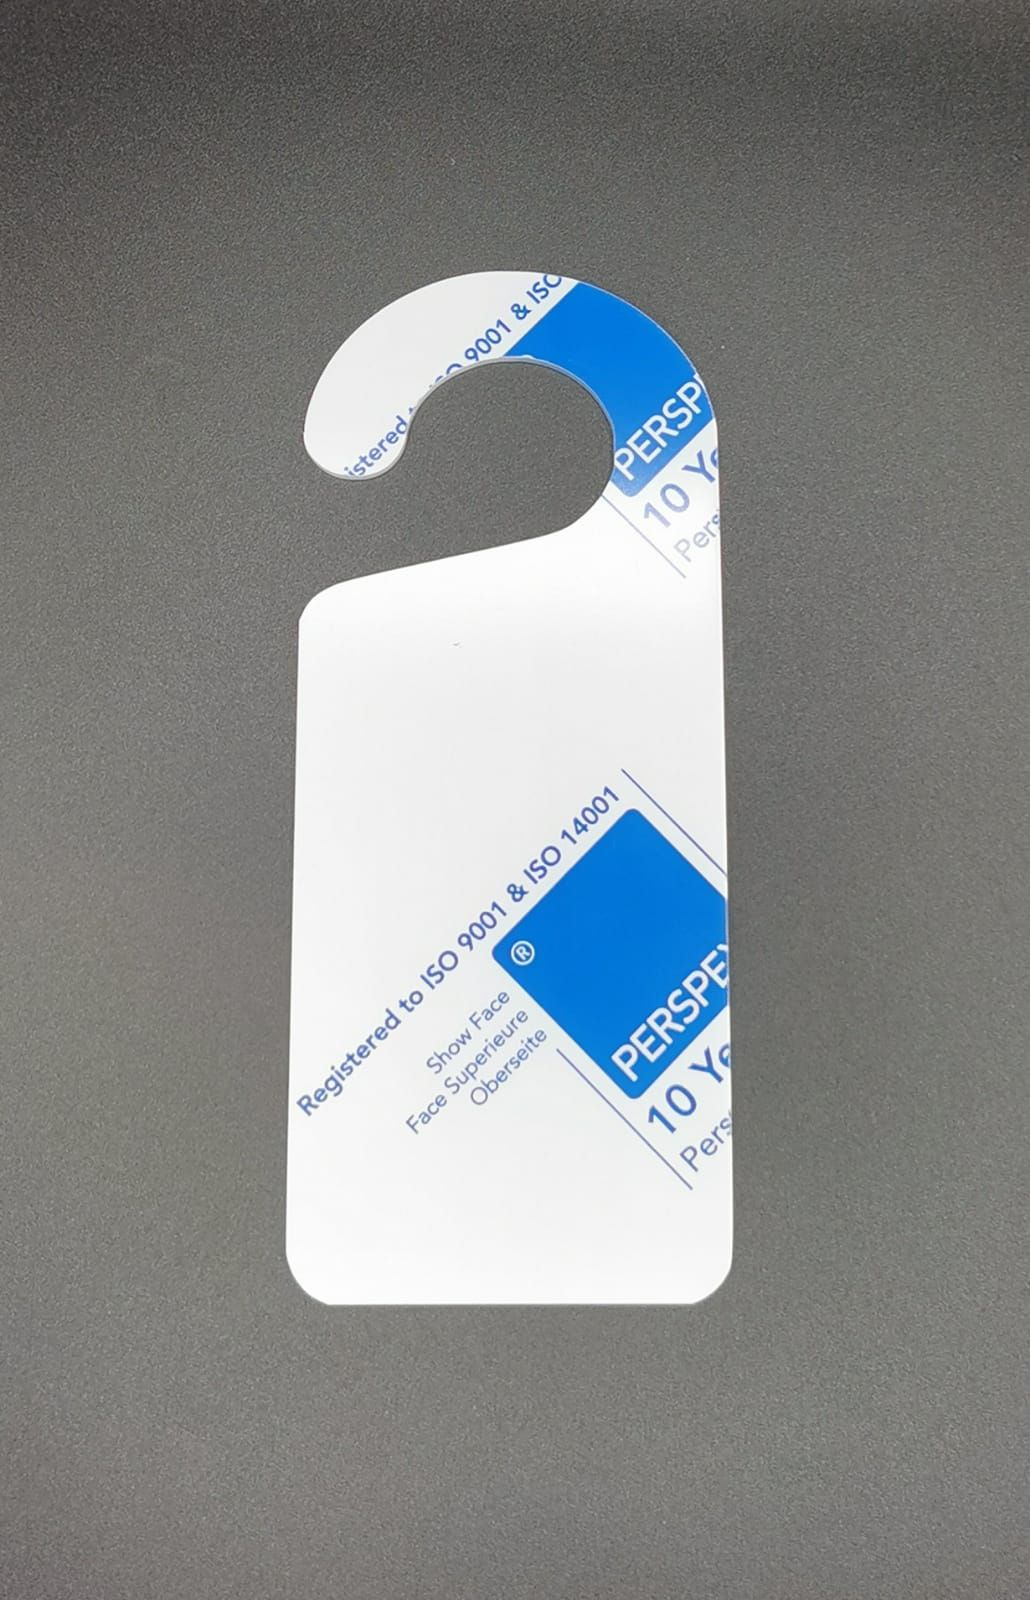 White Acrylic Door Hanger - 20x8.5cm - Various Pack Sizes